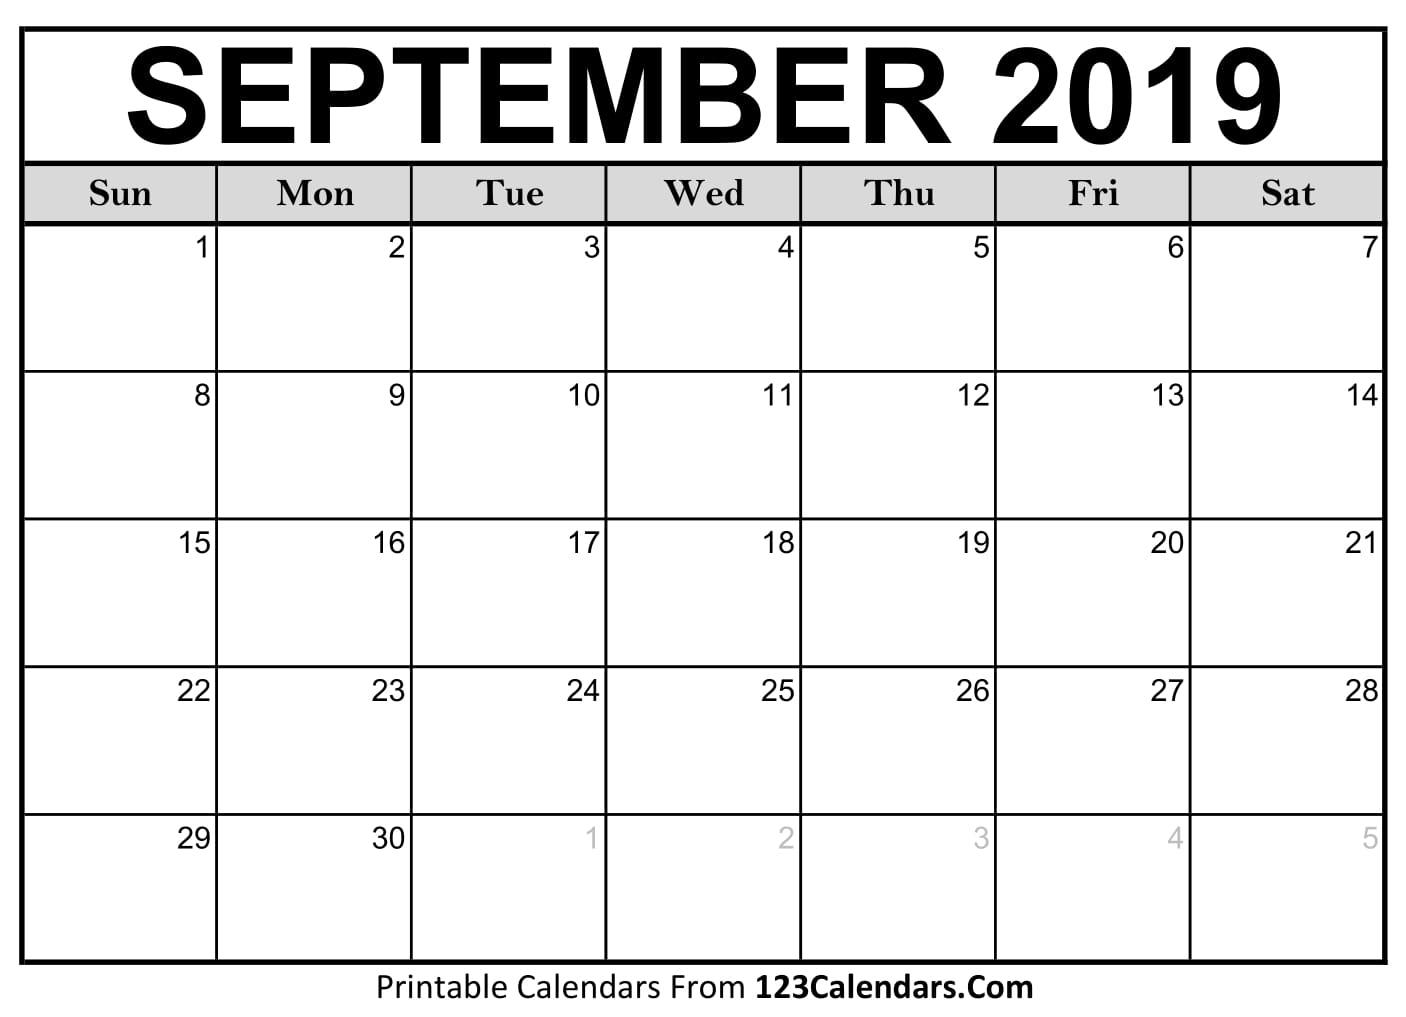 September 2019 Printable Calendar | 123Calendars